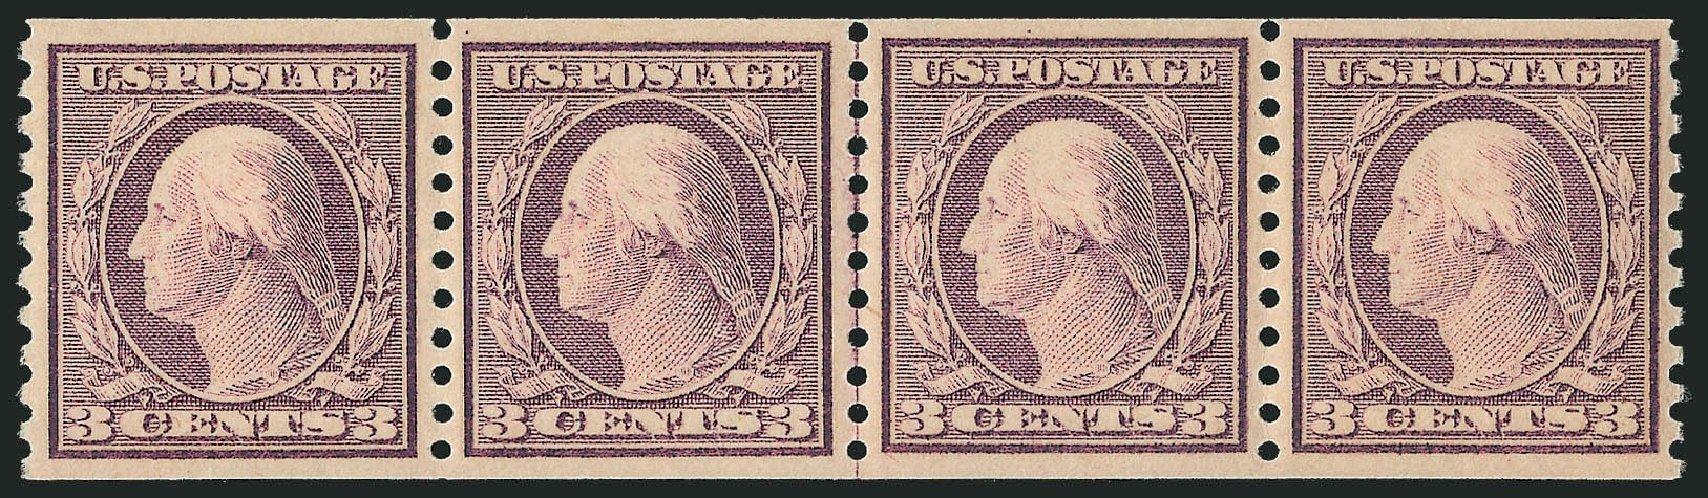 US Stamp Value Scott # 493 - 3c 1917 Washington Coil Perf 10 Vertically. Robert Siegel Auction Galleries, Jun 2012, Sale 1026, Lot 1437